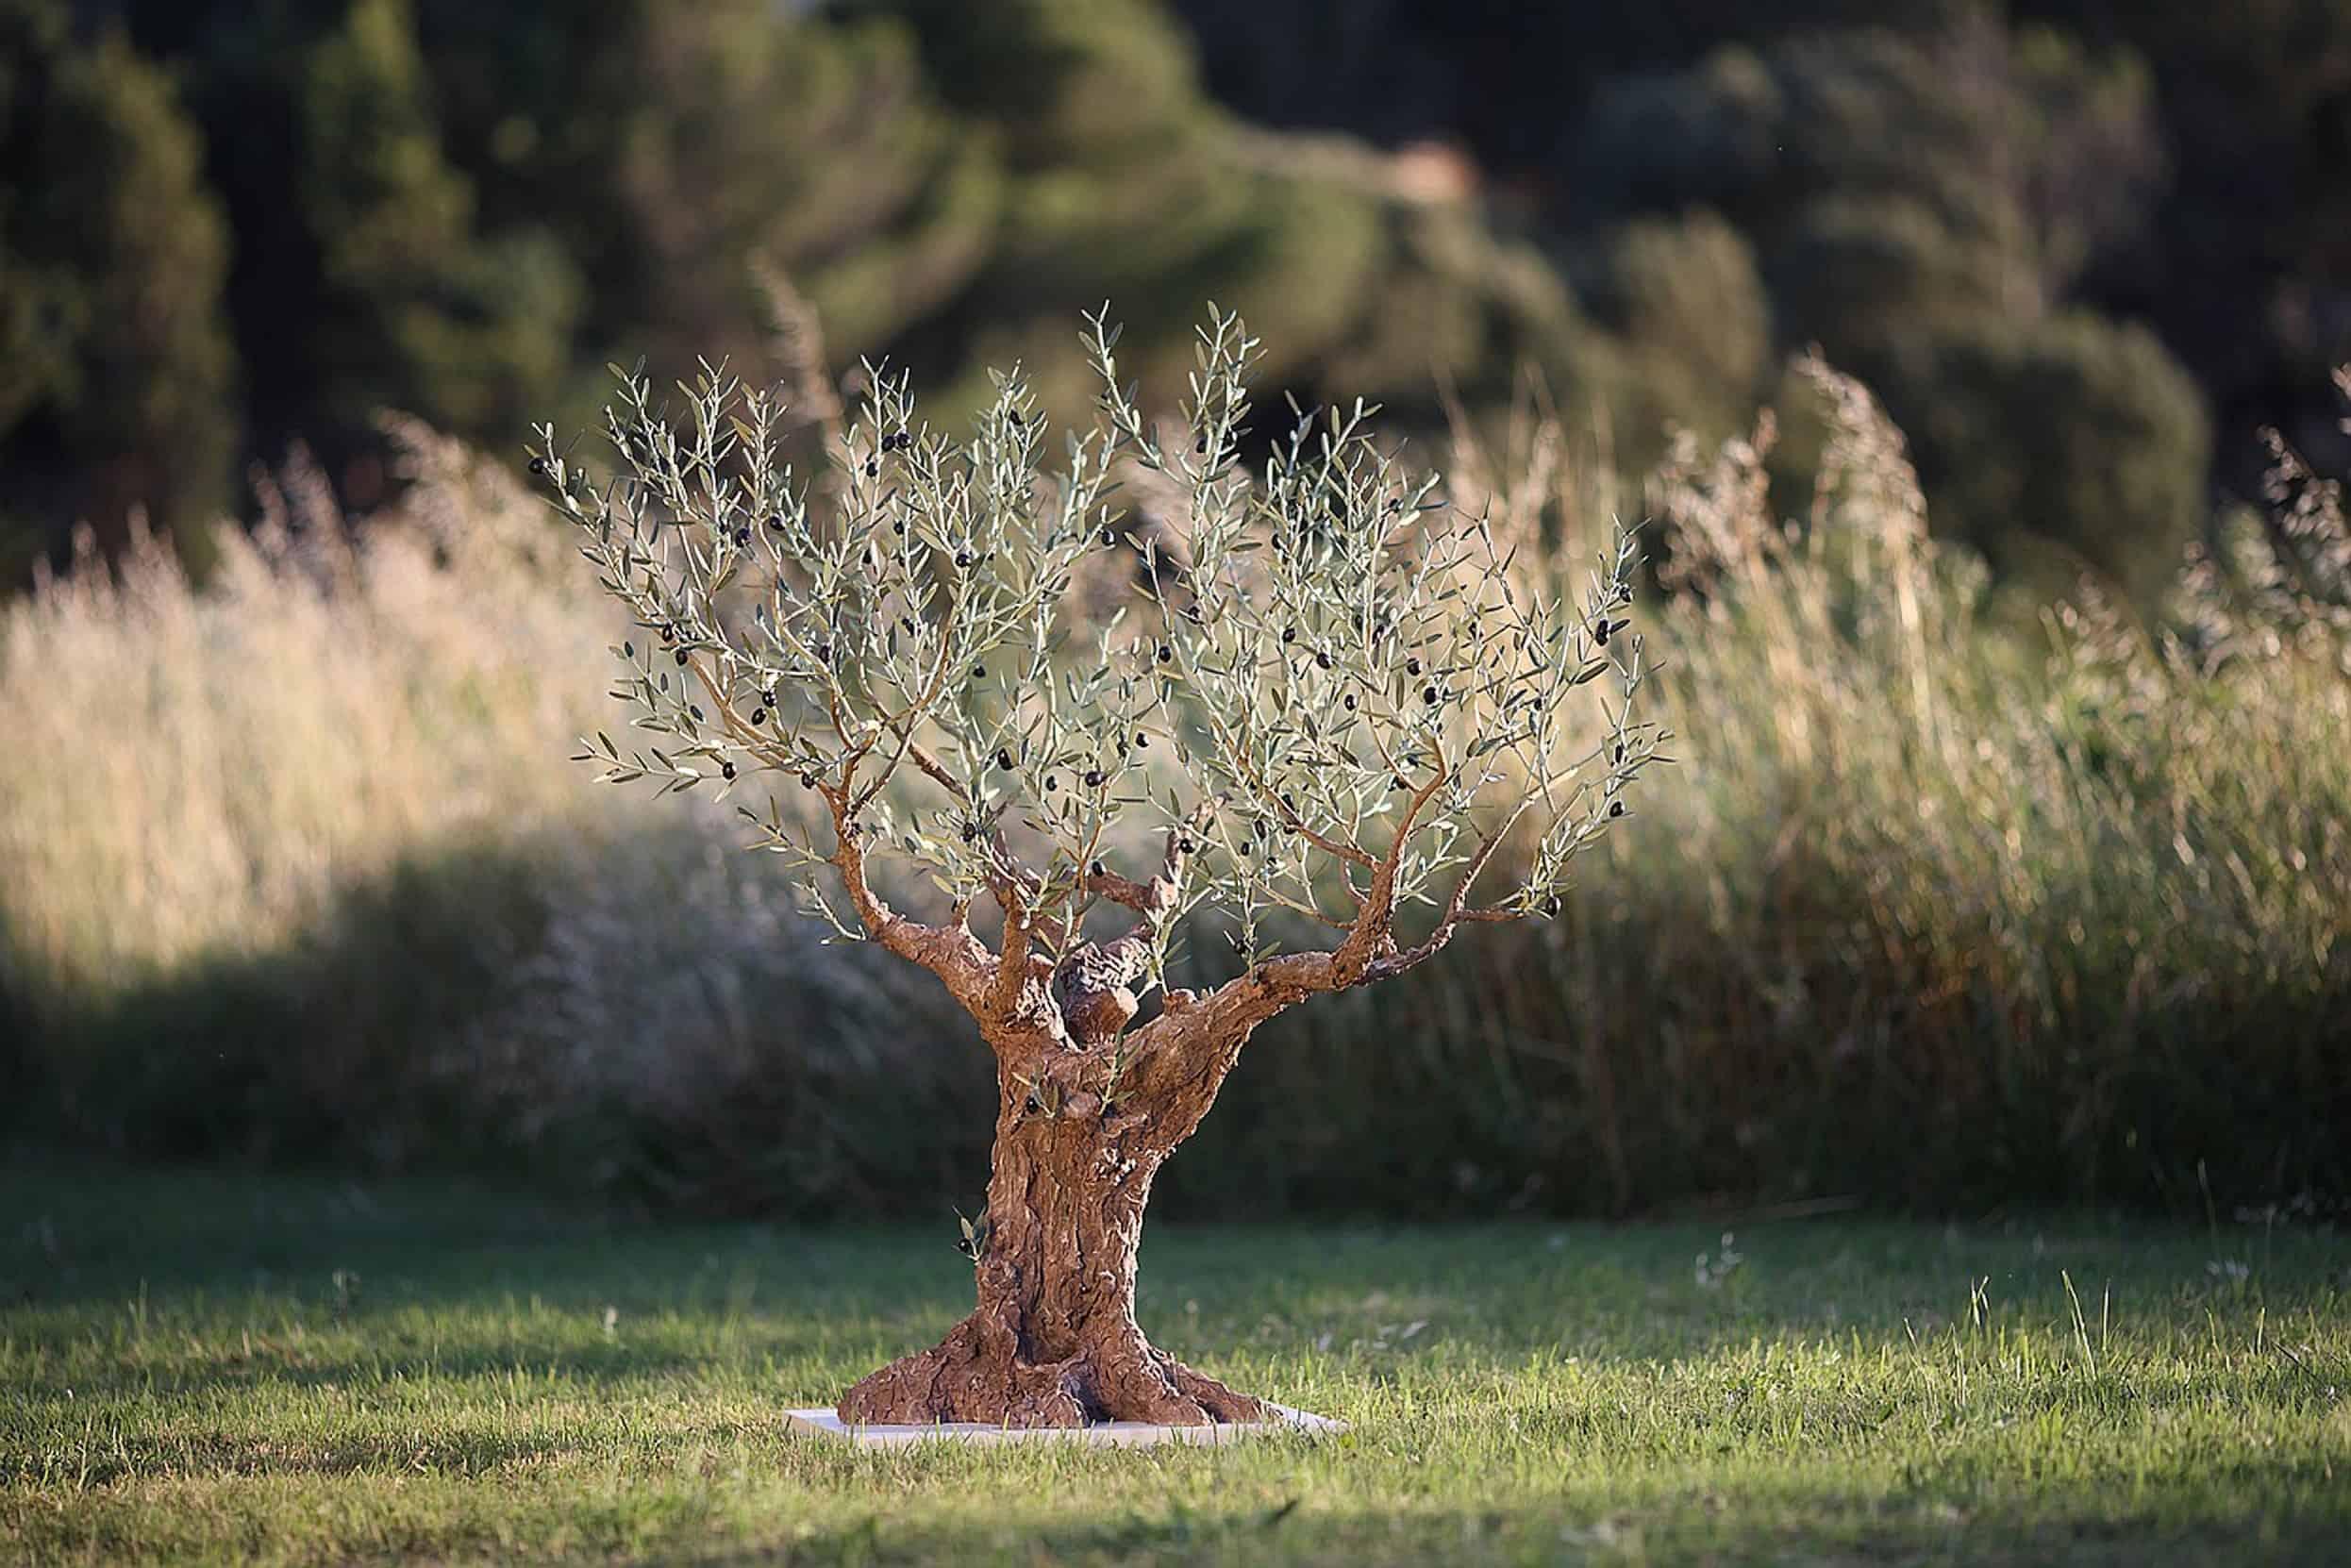 olivier-1.30-jardin-sur-socle-copy